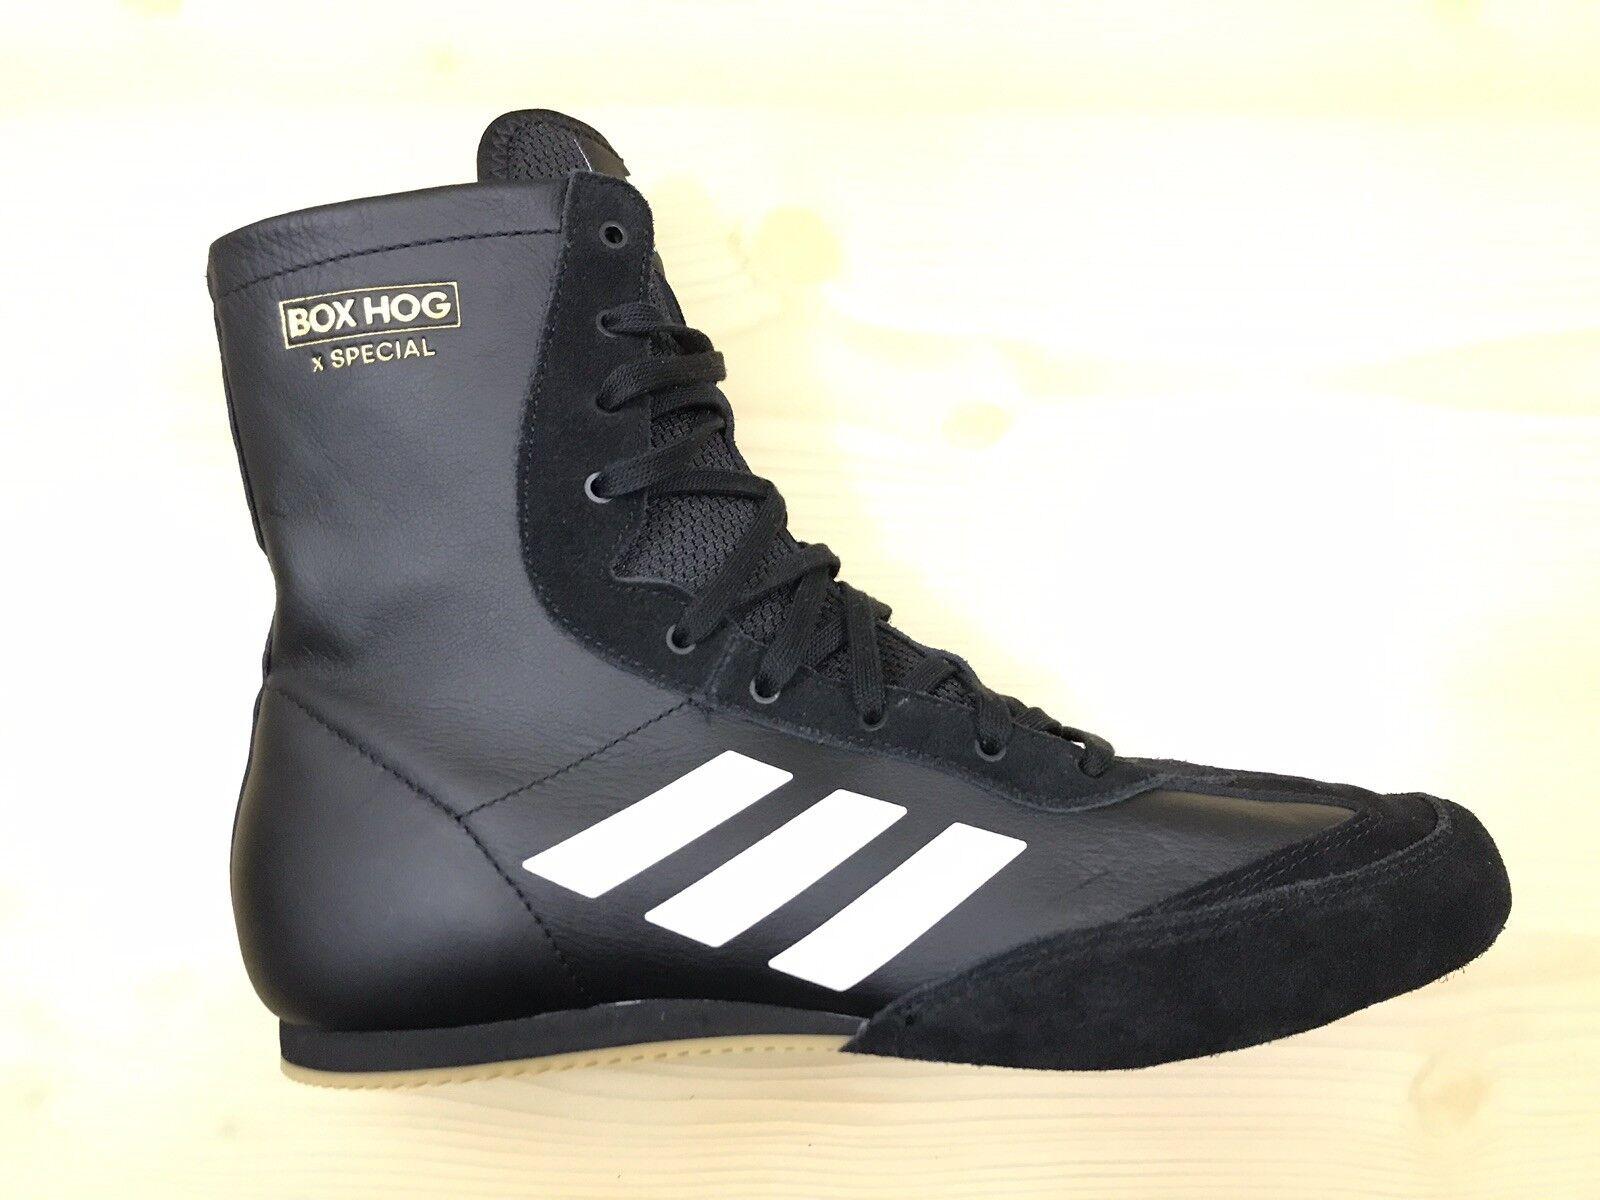 Adidas Box Hog X Special Athletic Black White shoes AC7157 Mens Size 8.5